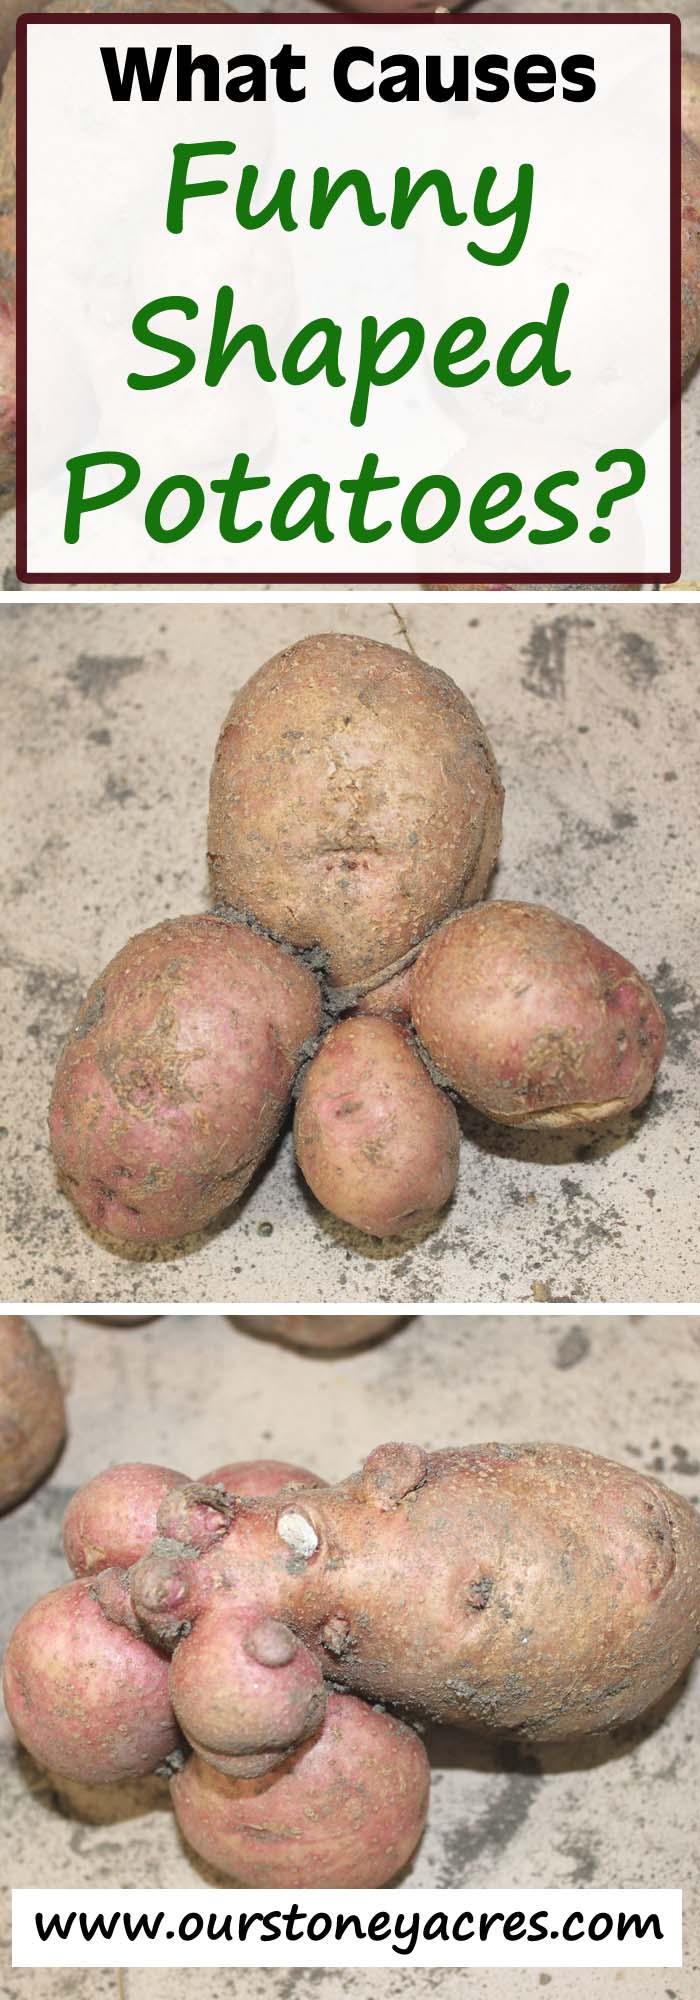 Funny Shaped Potatoes